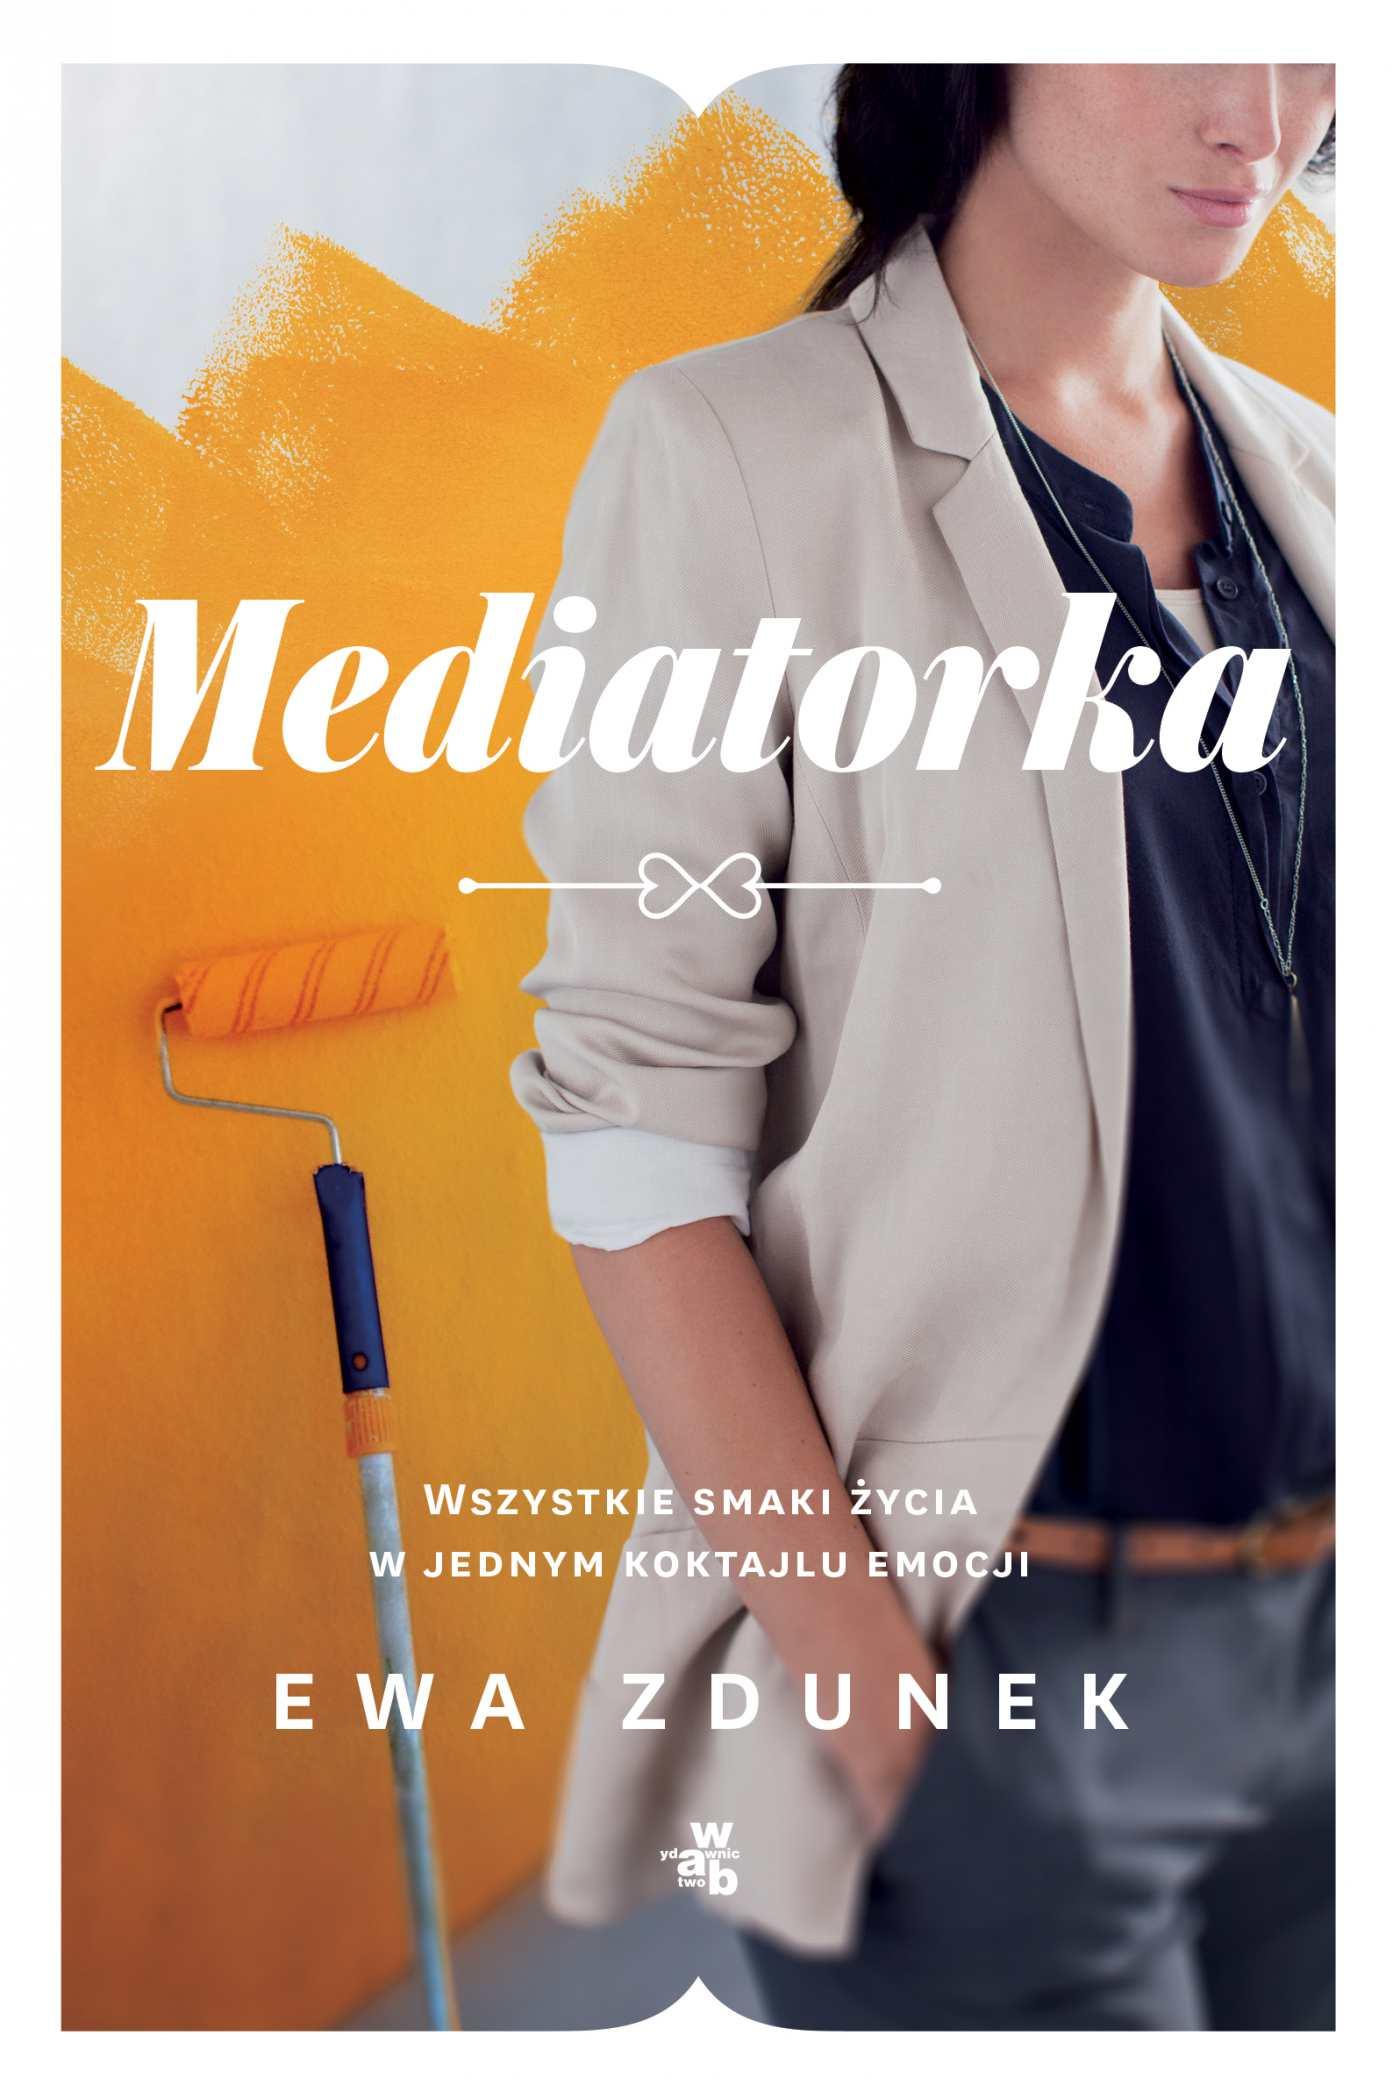 Mediatorka - Ebook (Książka na Kindle) do pobrania w formacie MOBI